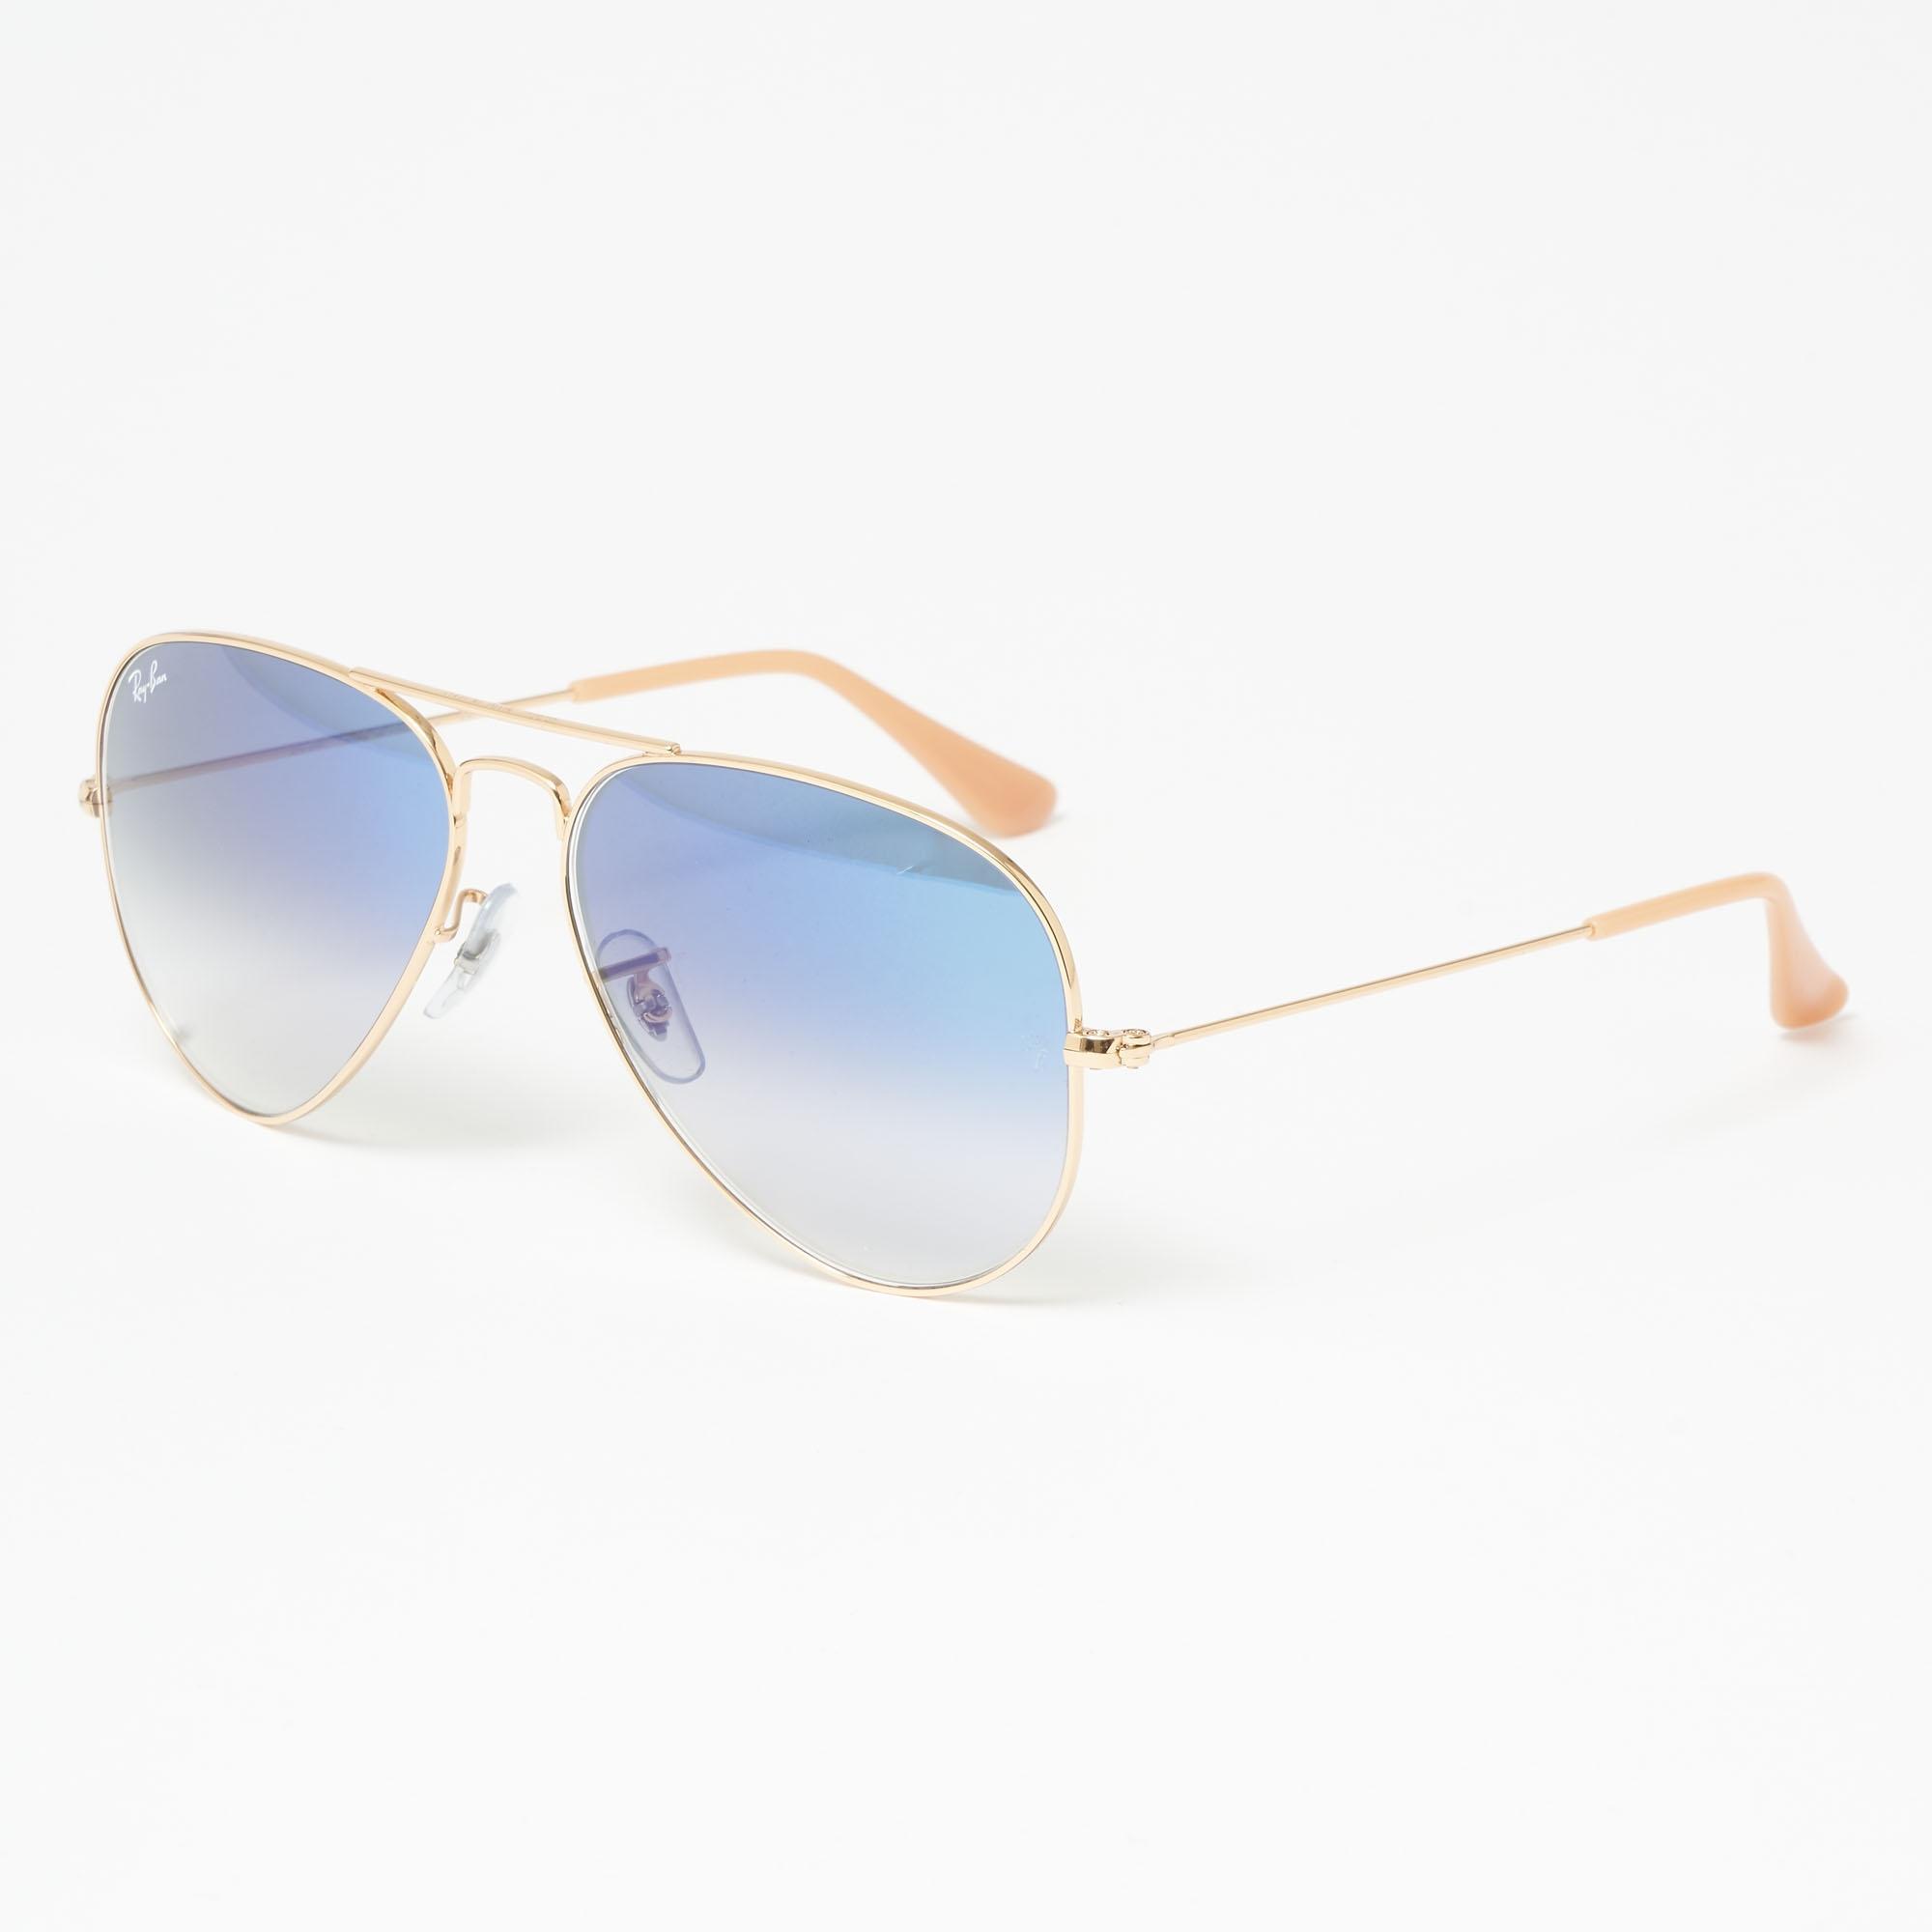 cf9c7f191a87c Ray-Ban. Men s Metallic Gold Aviator Gradient Sunglasses - Light Blue  Gradient Lenses